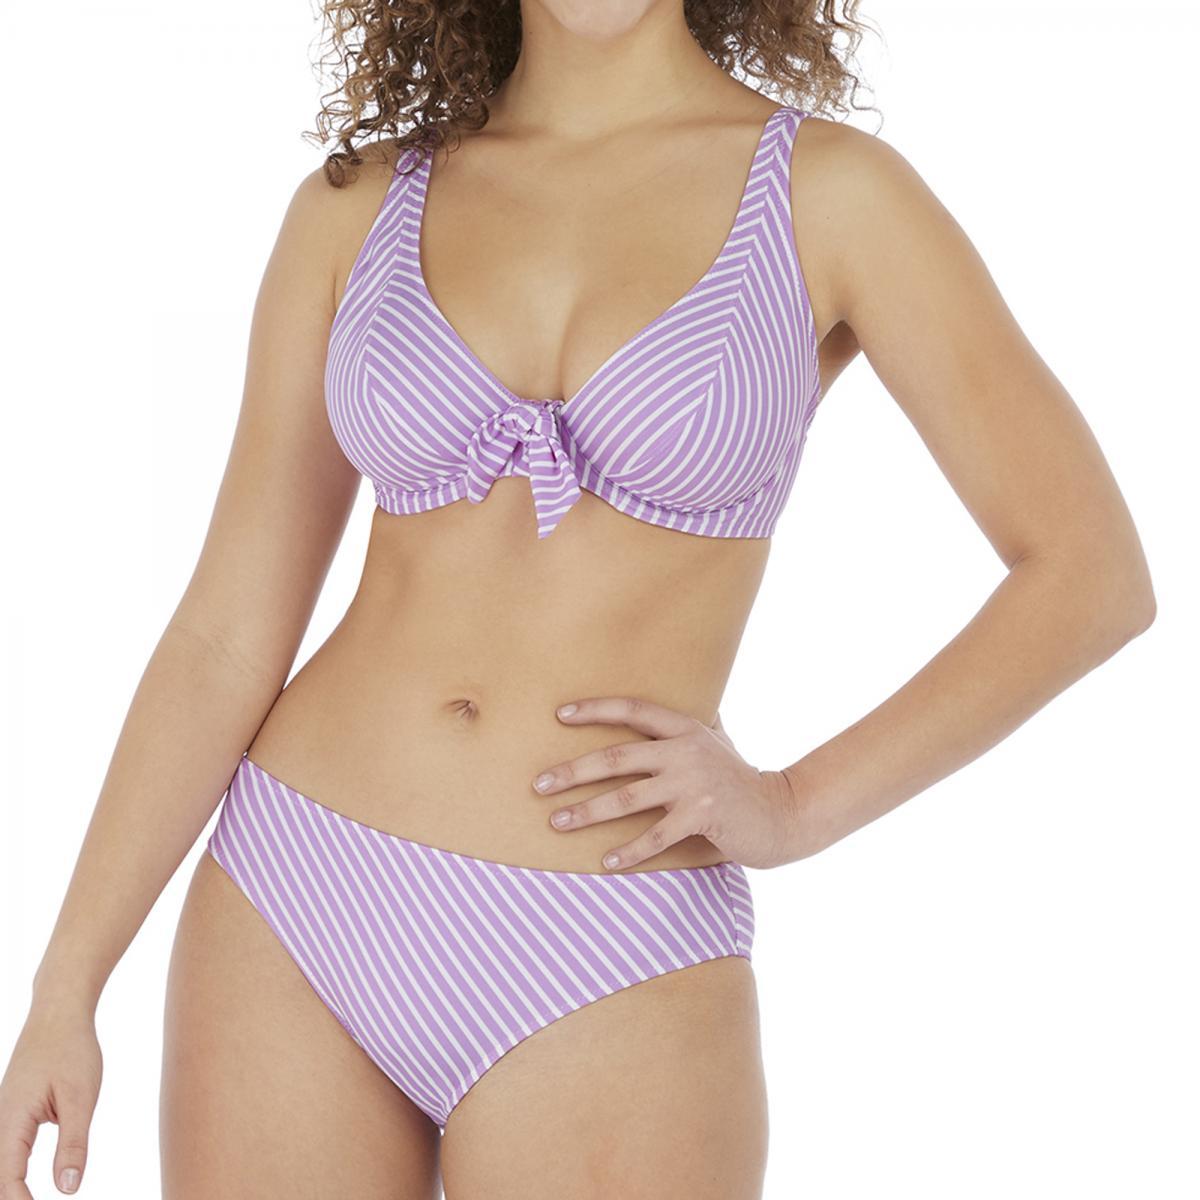 Haut de maillot de bain apex foulard armatures Violet - Freya